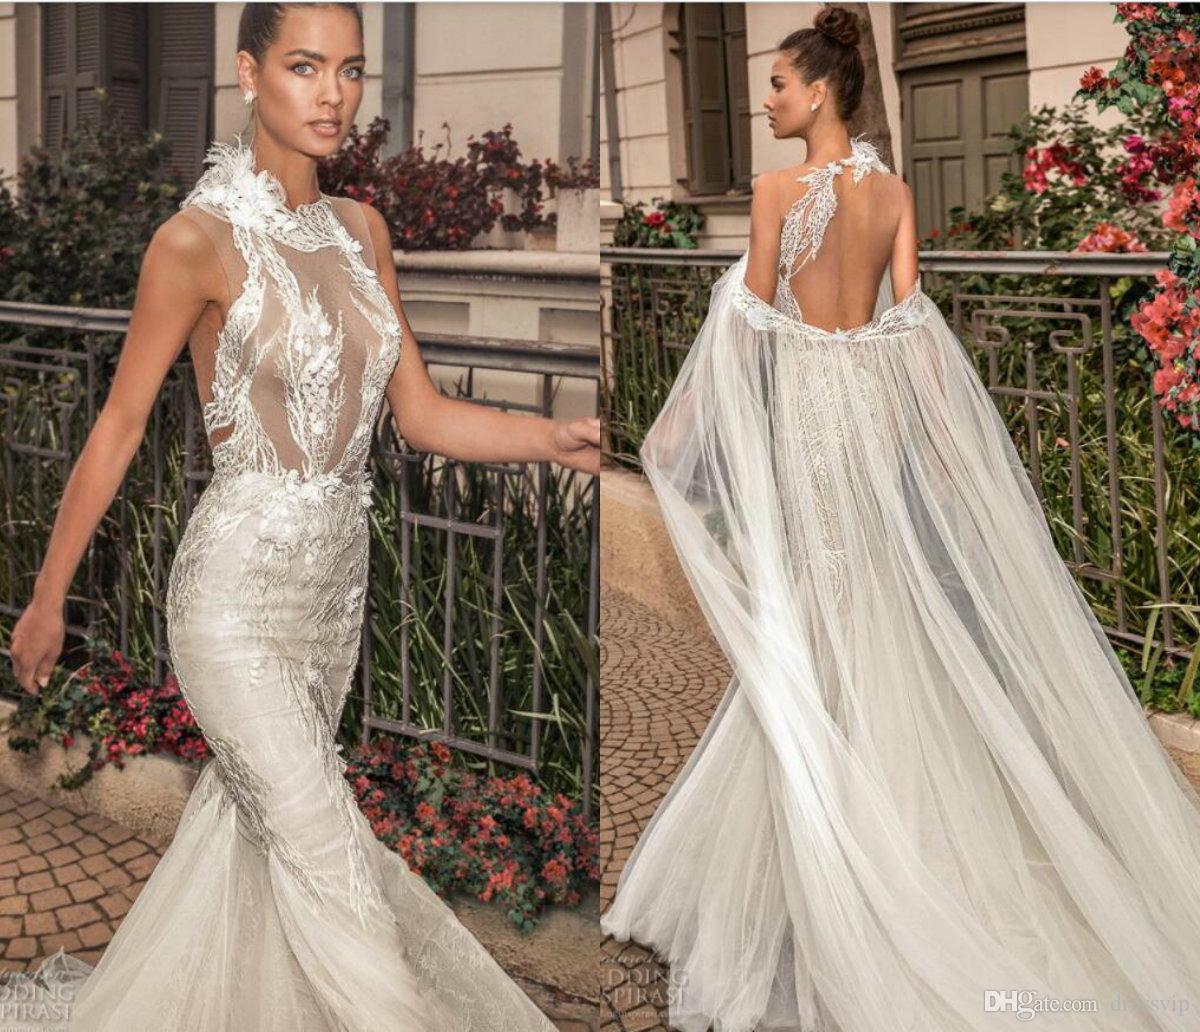 Elihav Sasson Sirena Vestidos de novia con apliques de encaje Cape Illusion Sweep Train Backless Beach Beach Vestidos de novia más tamaño vestido de novia